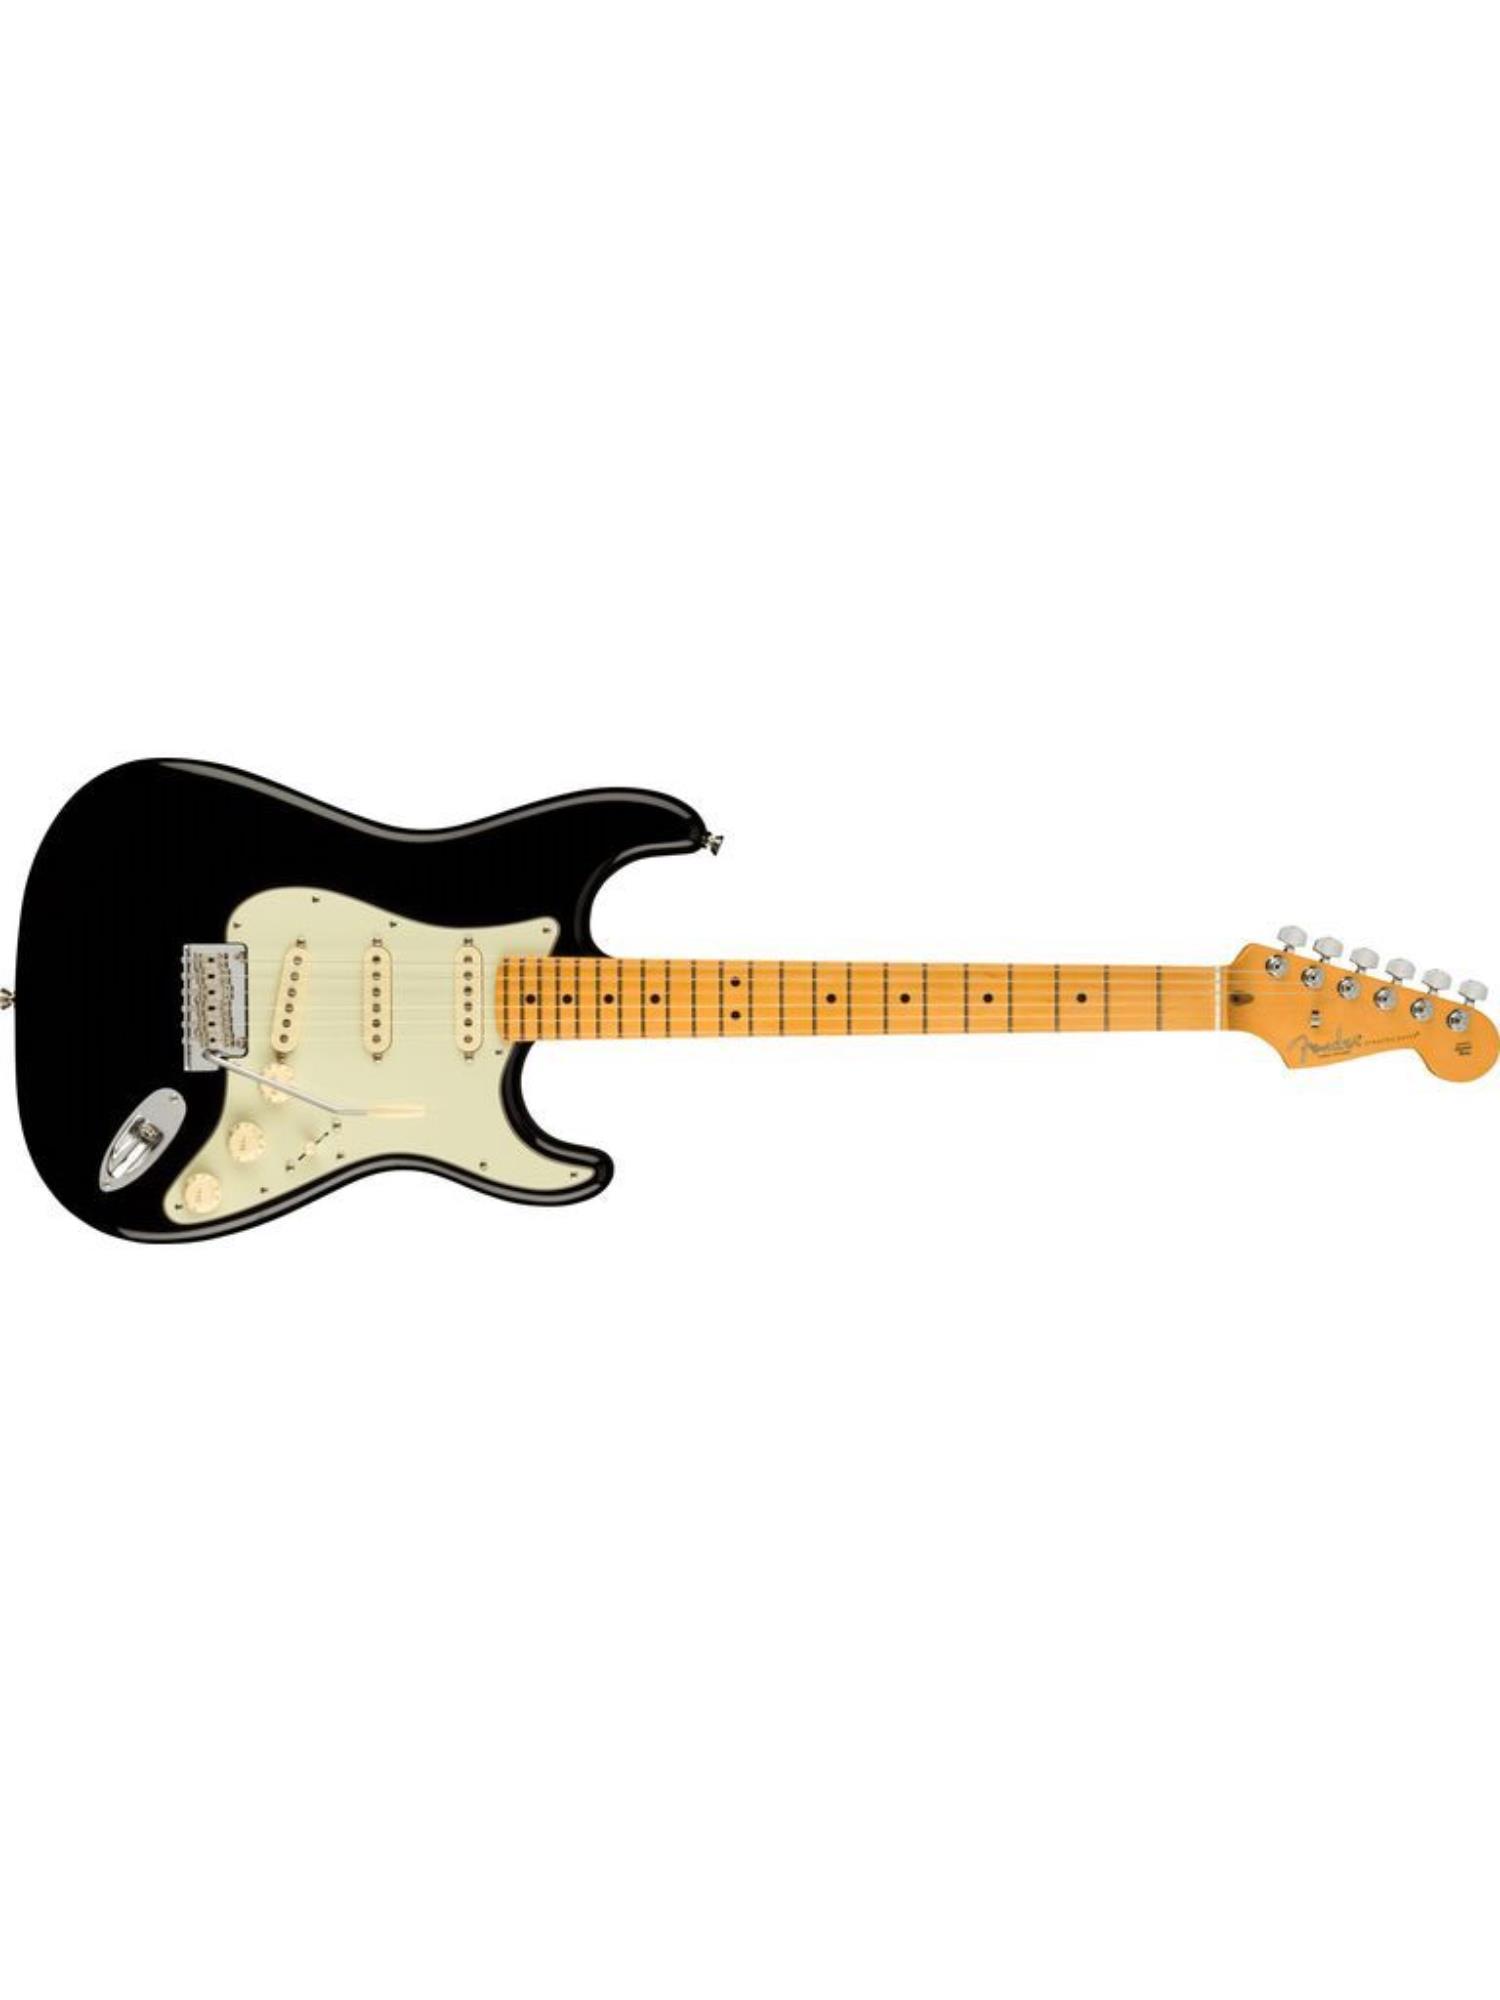 FENDER-American-Professional-PRO-II-Stratocaster-MN-Black-0113902706-sku-24381